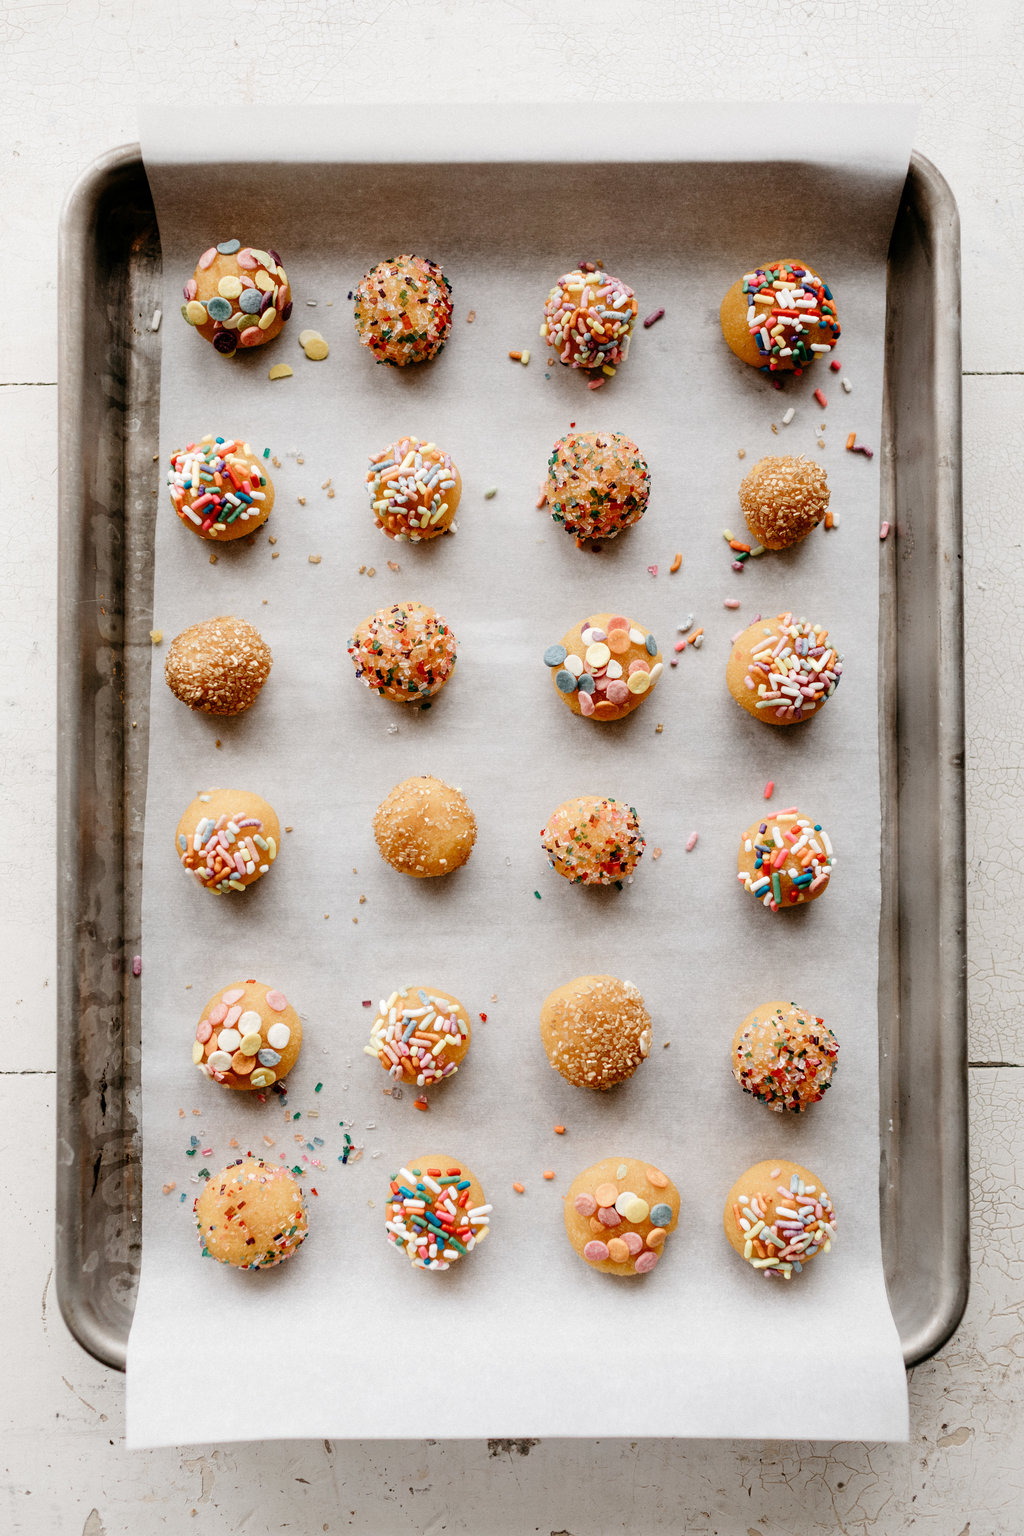 molly-yeh-bobsredmill-marzipan-cookies-20.jpg